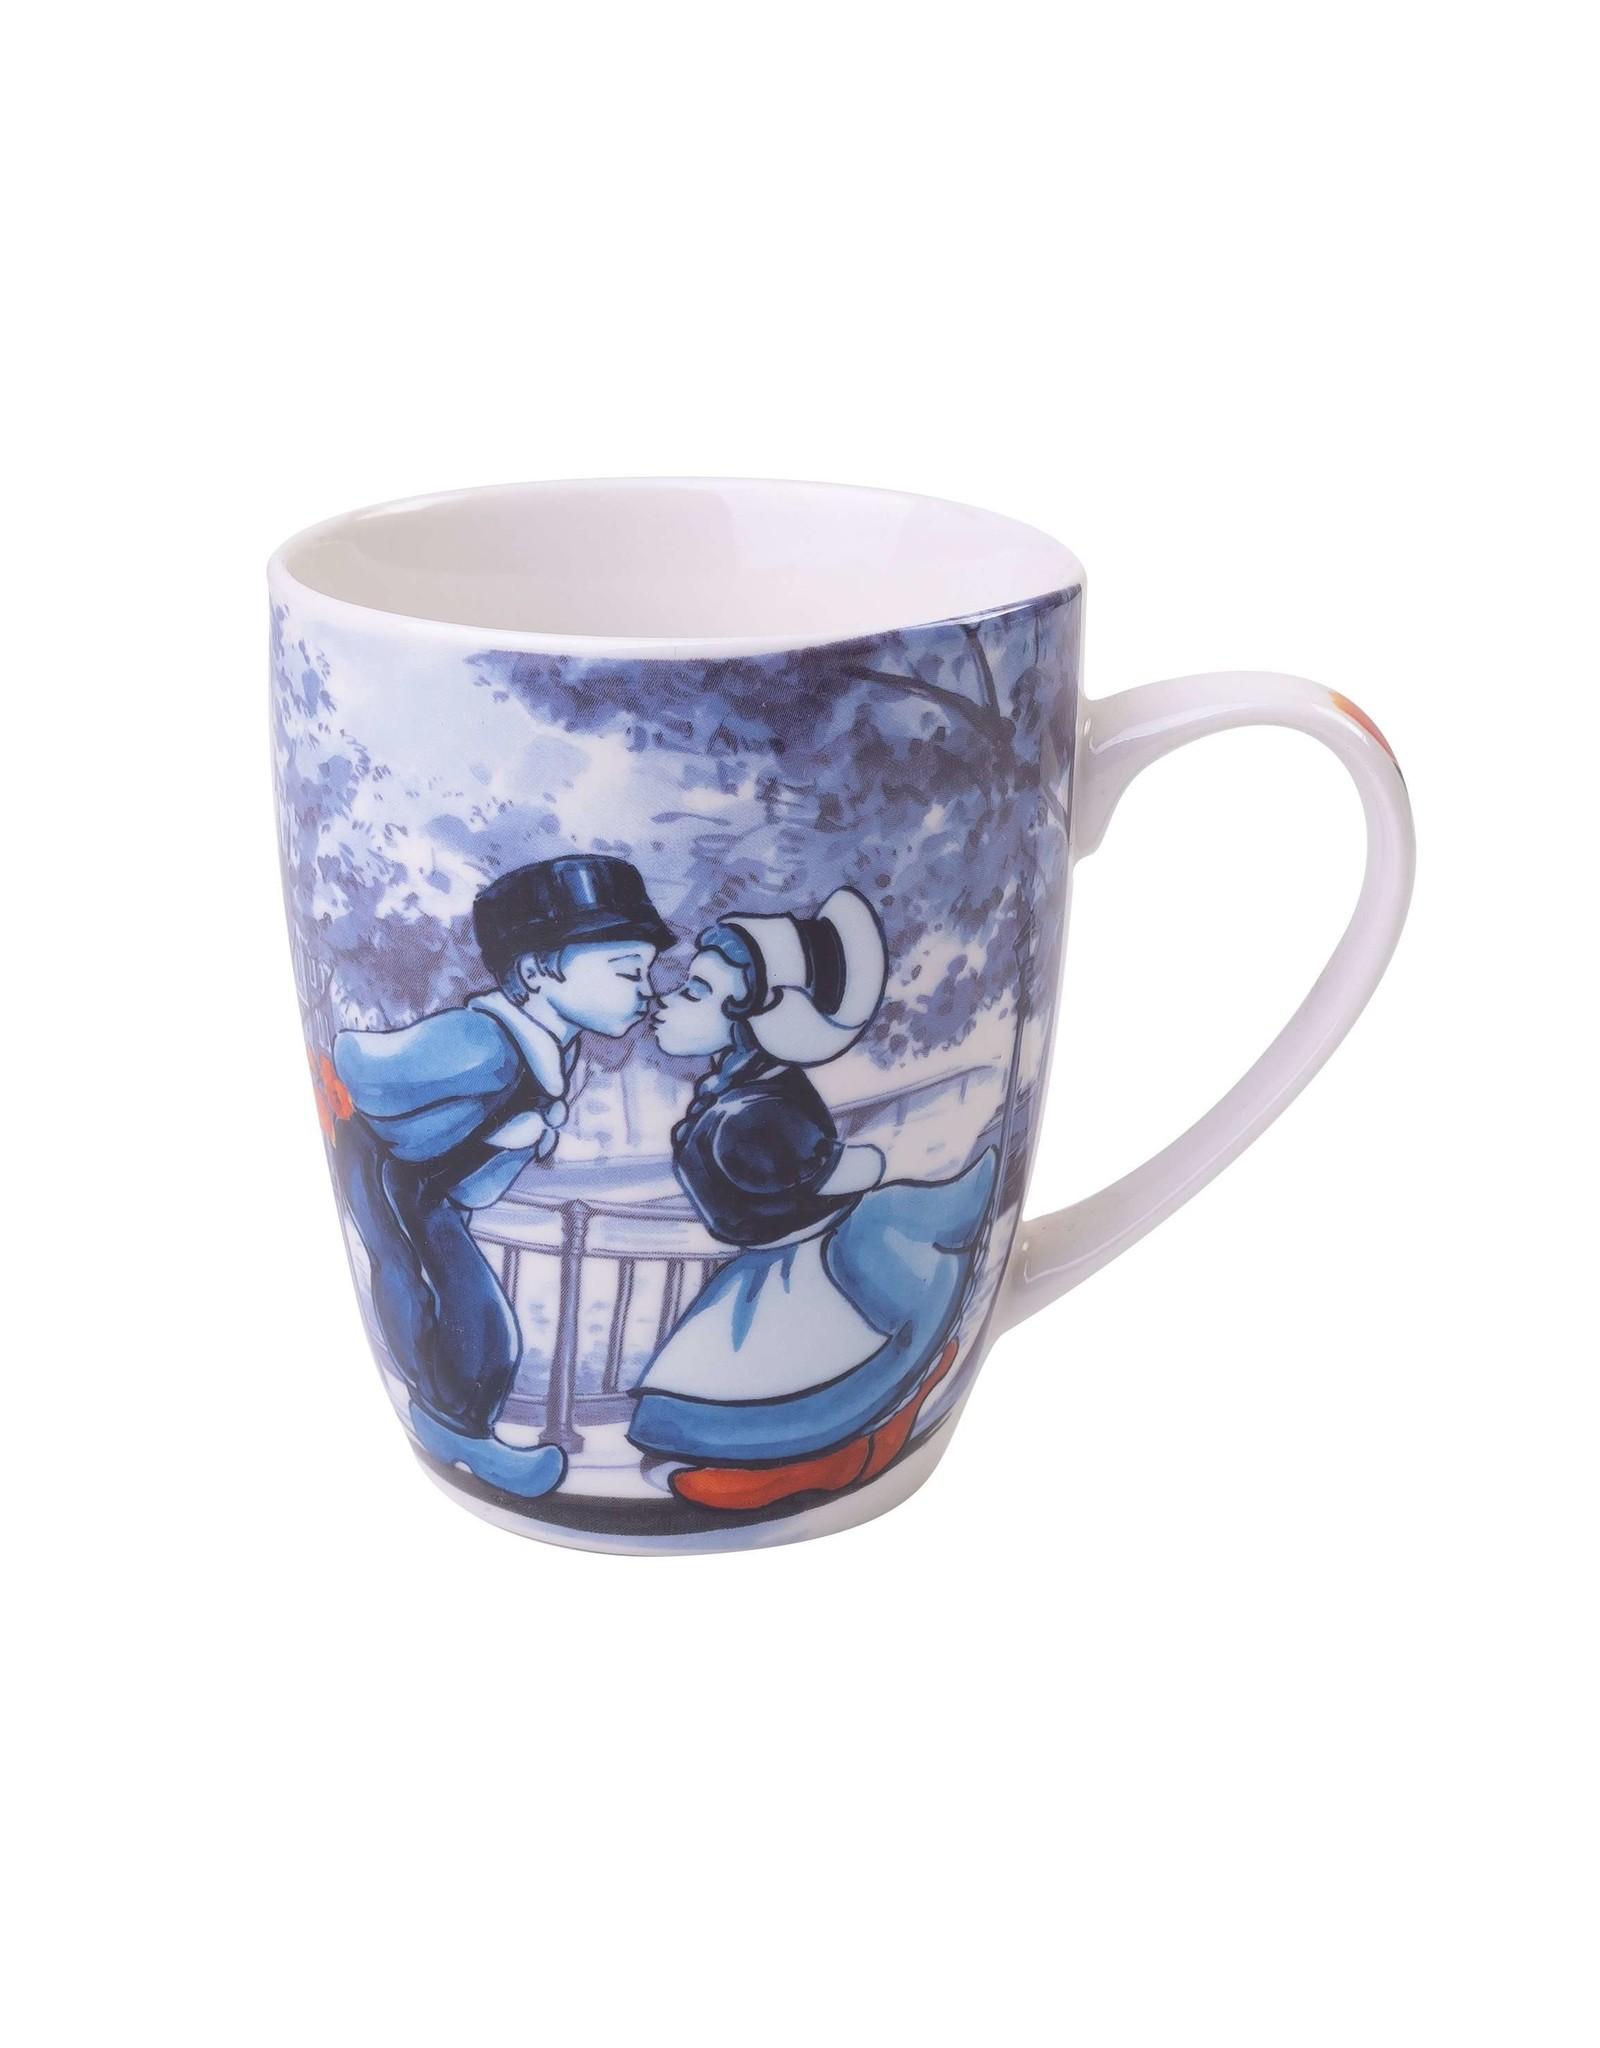 Heinen Delfts Blauw Delft Blue Mug with a Dutch Kissing Couple, 300 ml / 10,1 oz